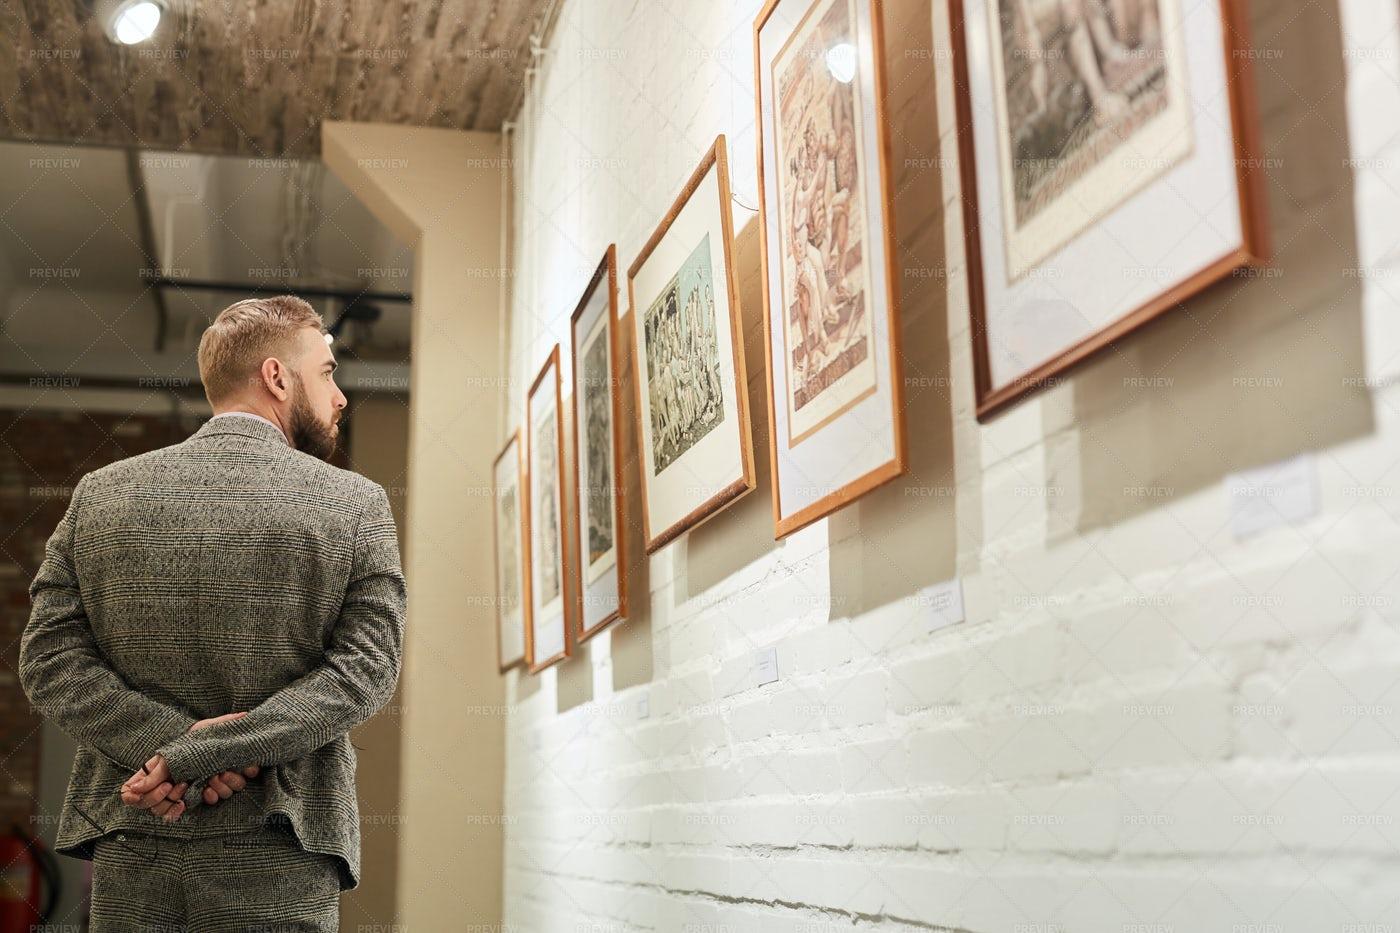 Browsing The Gallery Art: Stock Photos